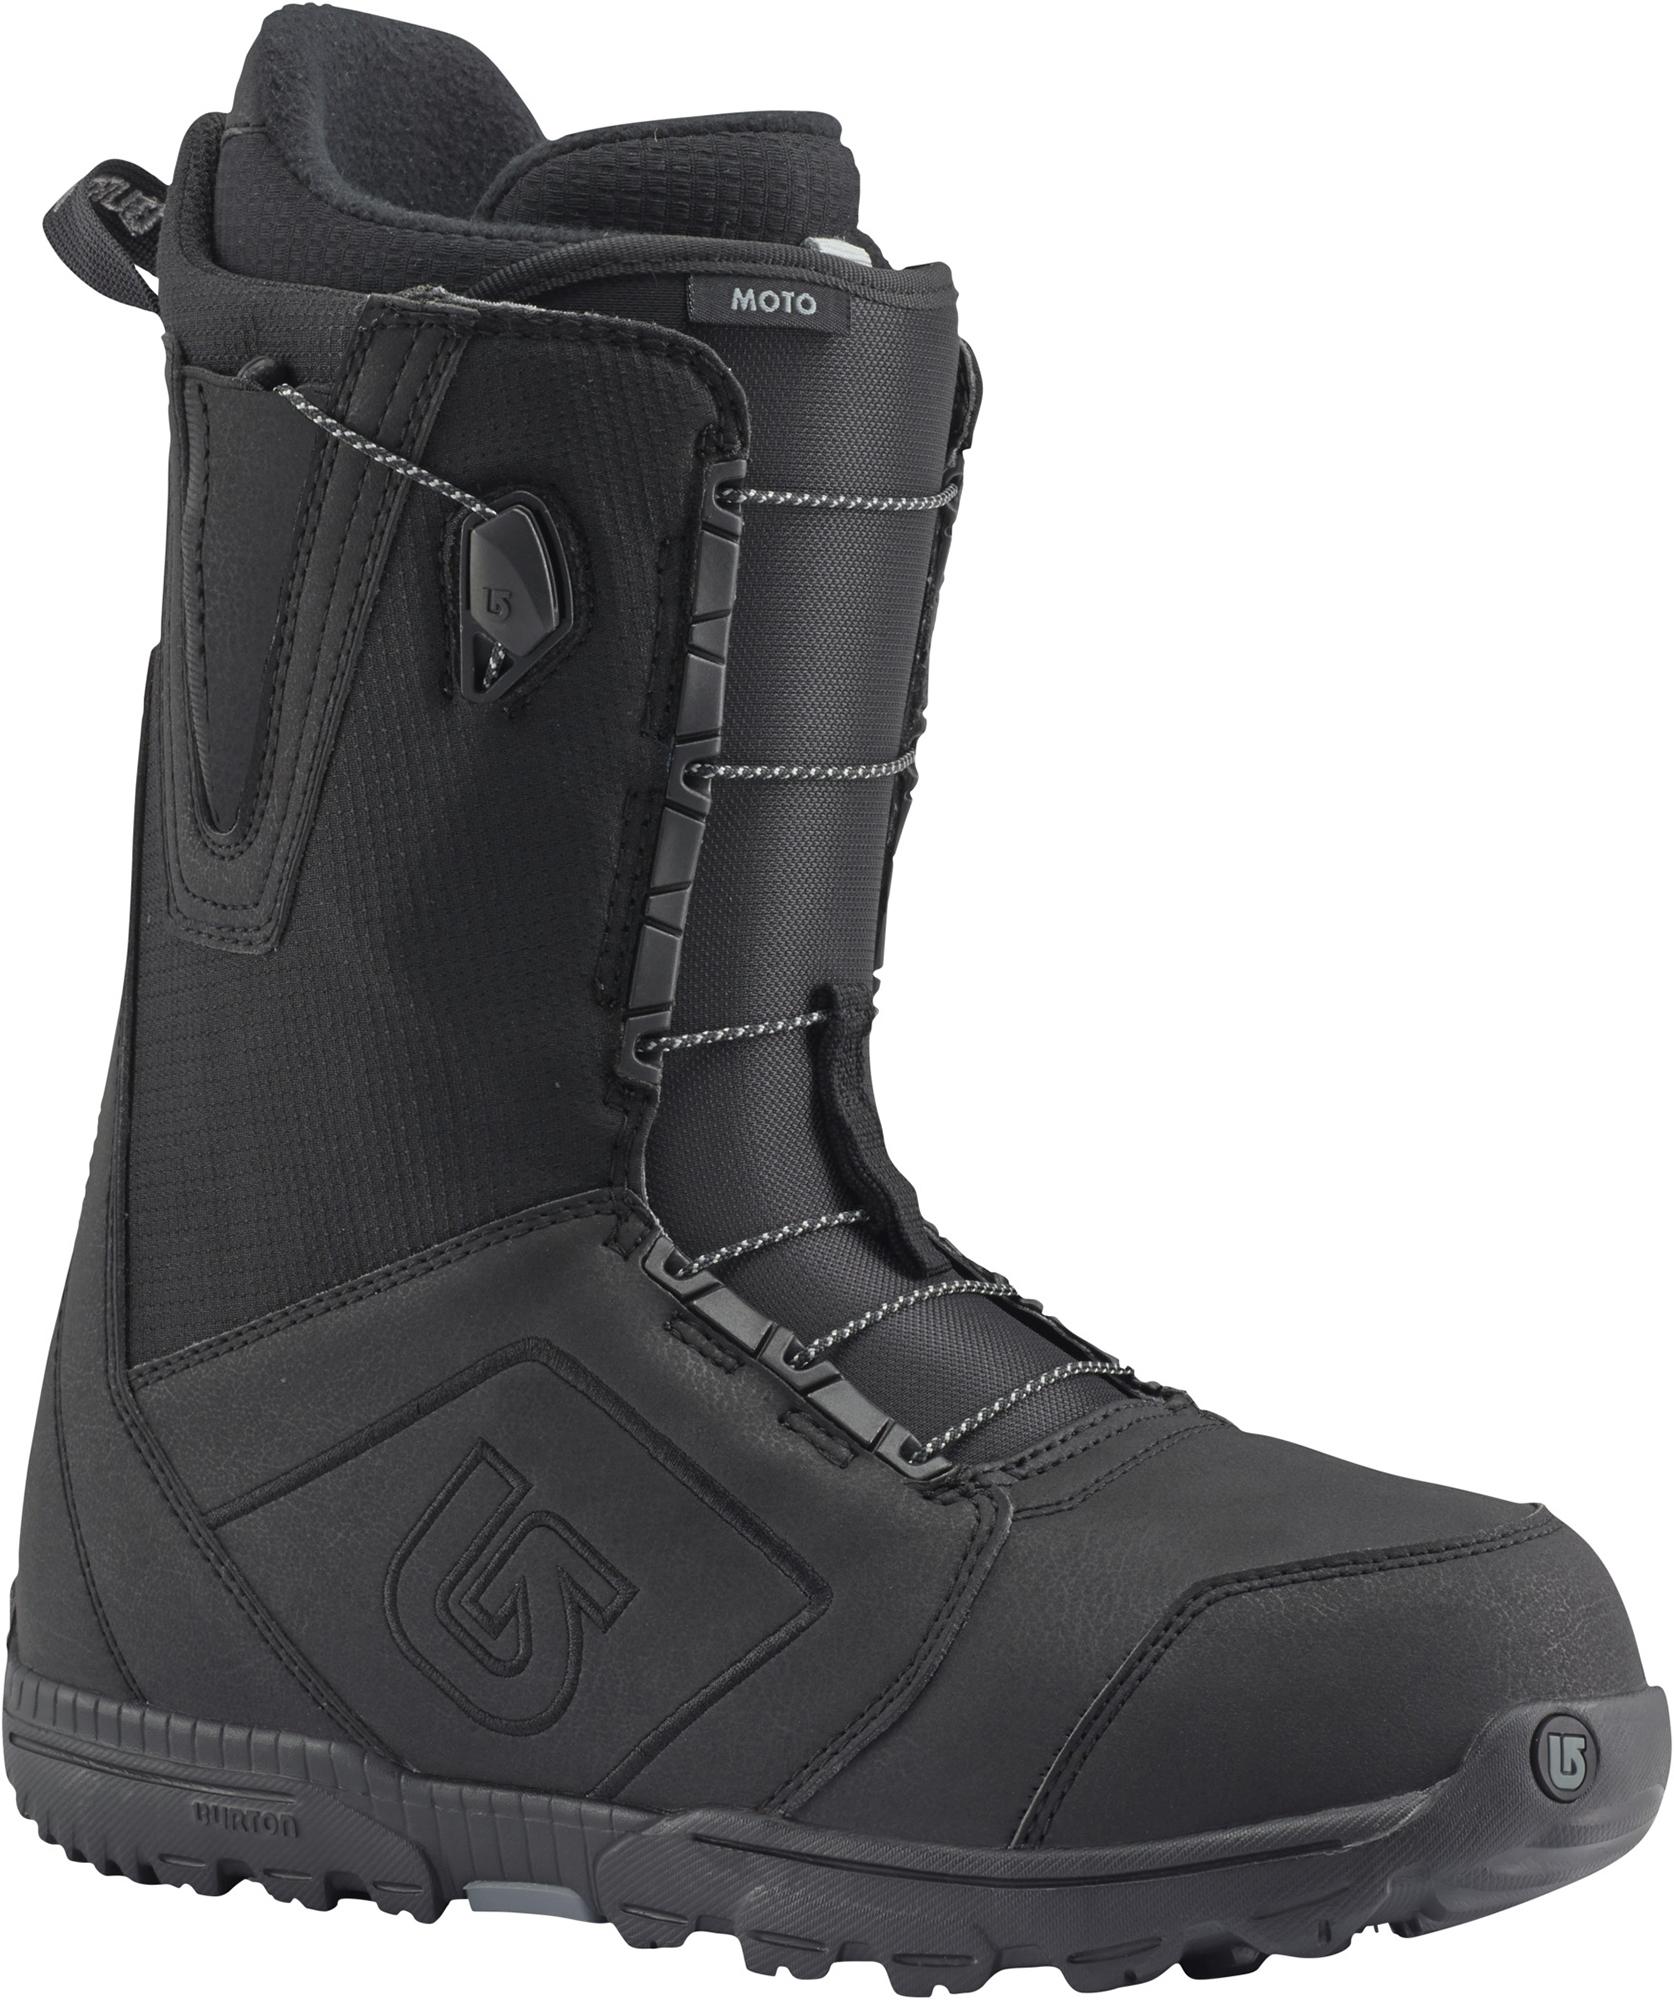 Burton Ботинки сноубордические Burton Moto